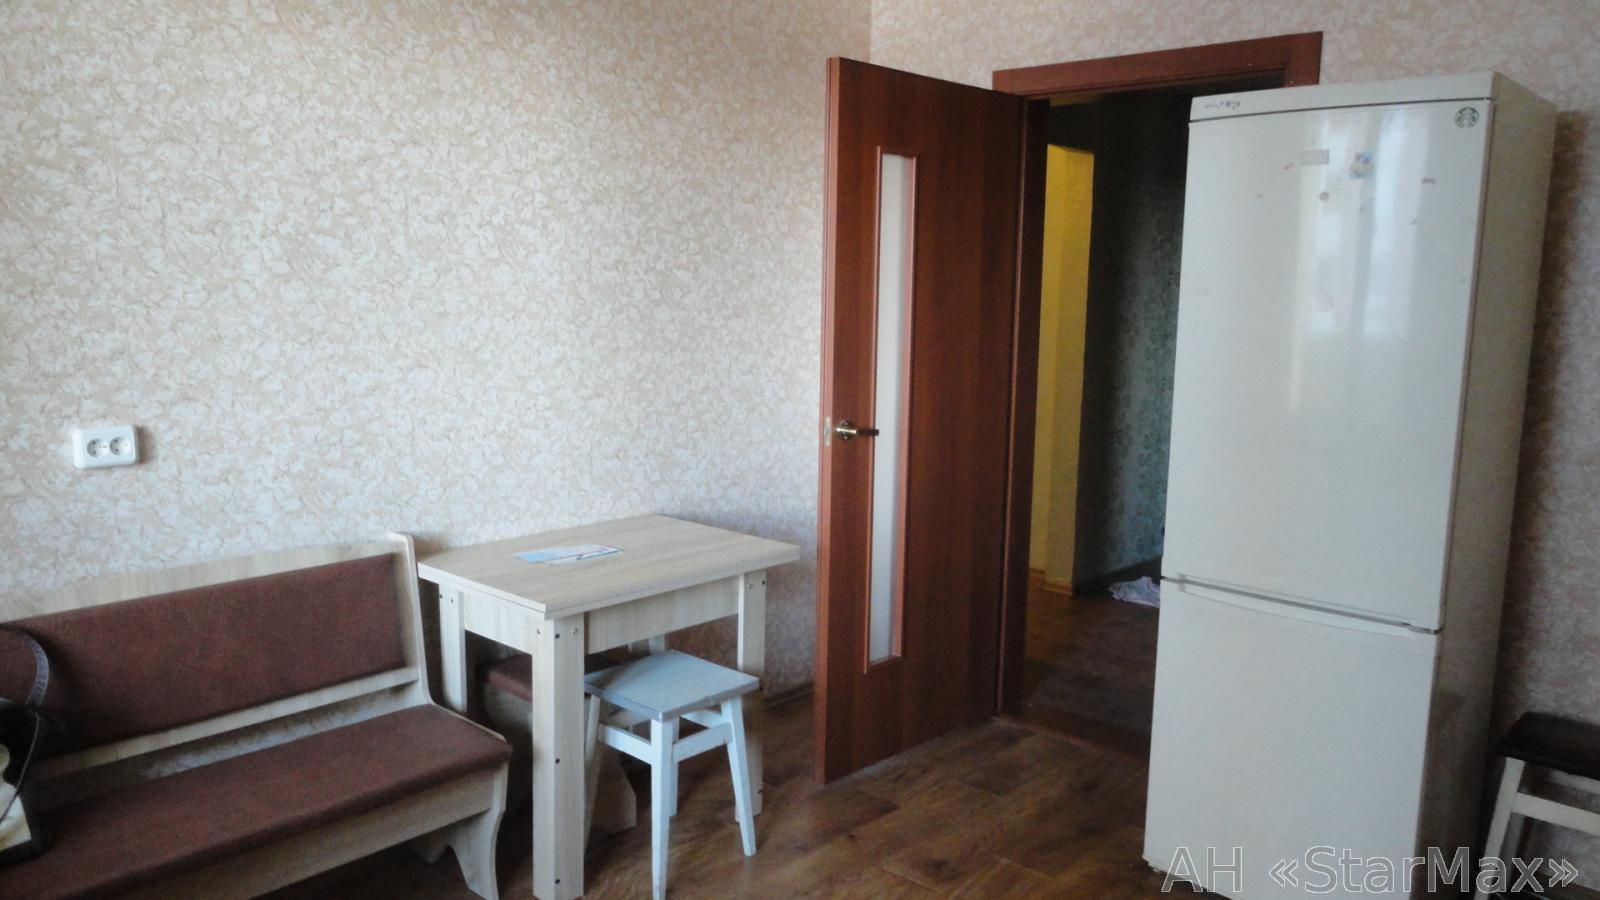 Продам квартиру Вышгород, Кургузова ул. 4